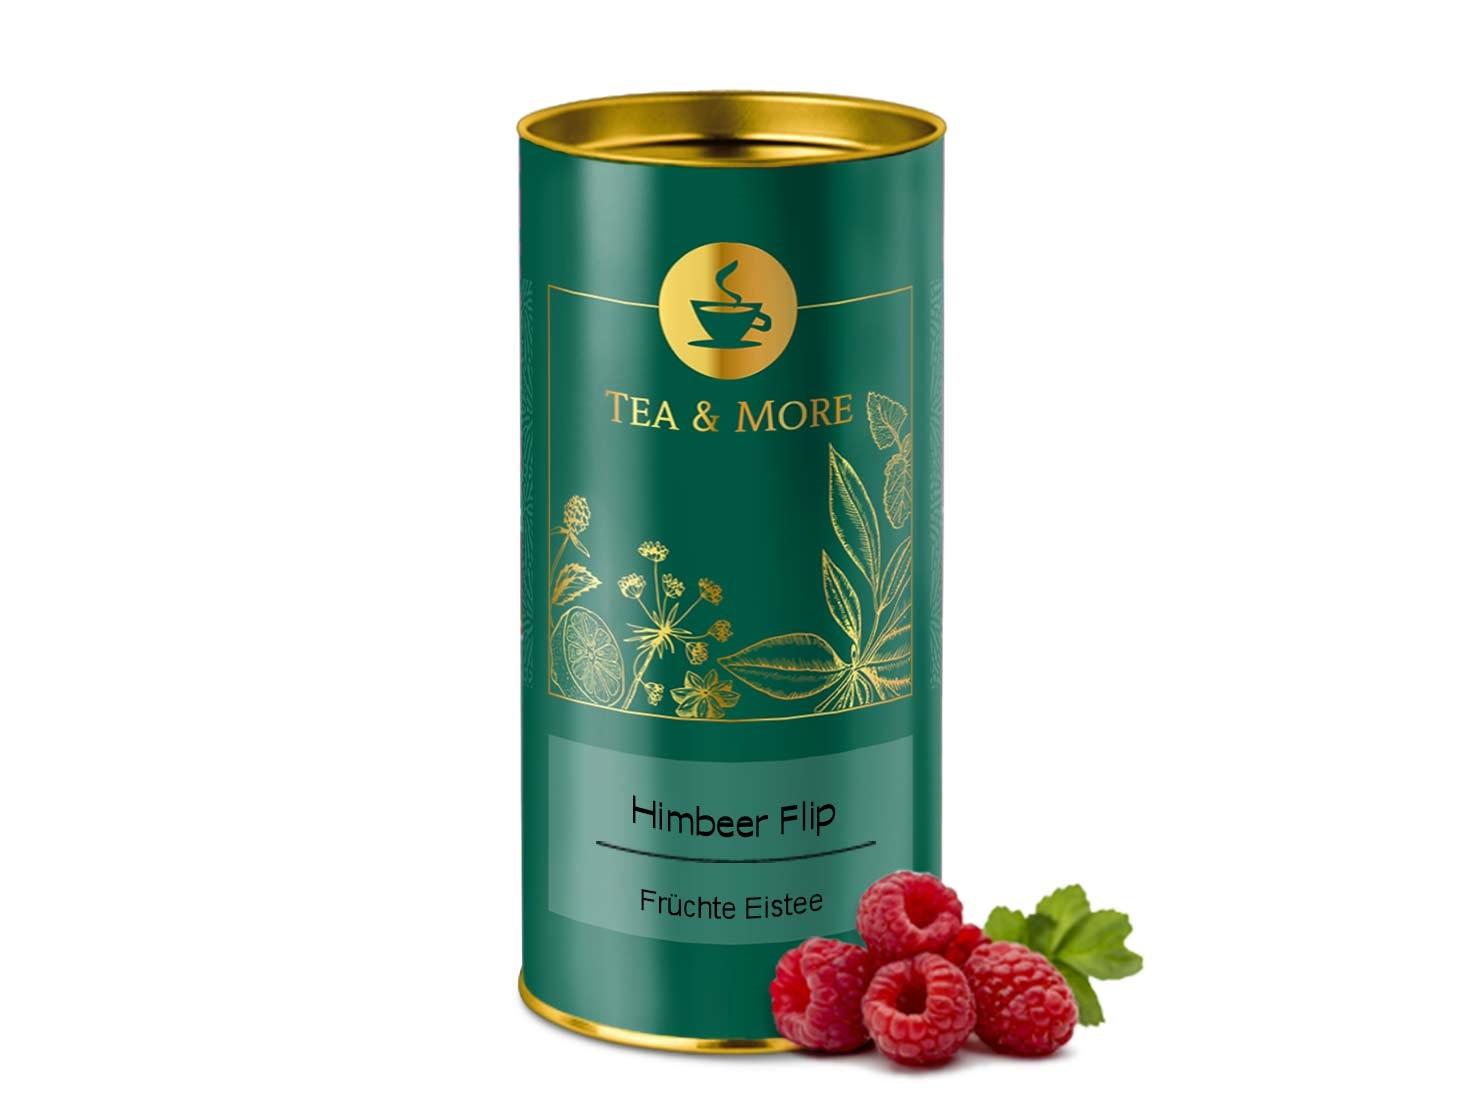 Raspberry Flip Iced Tea